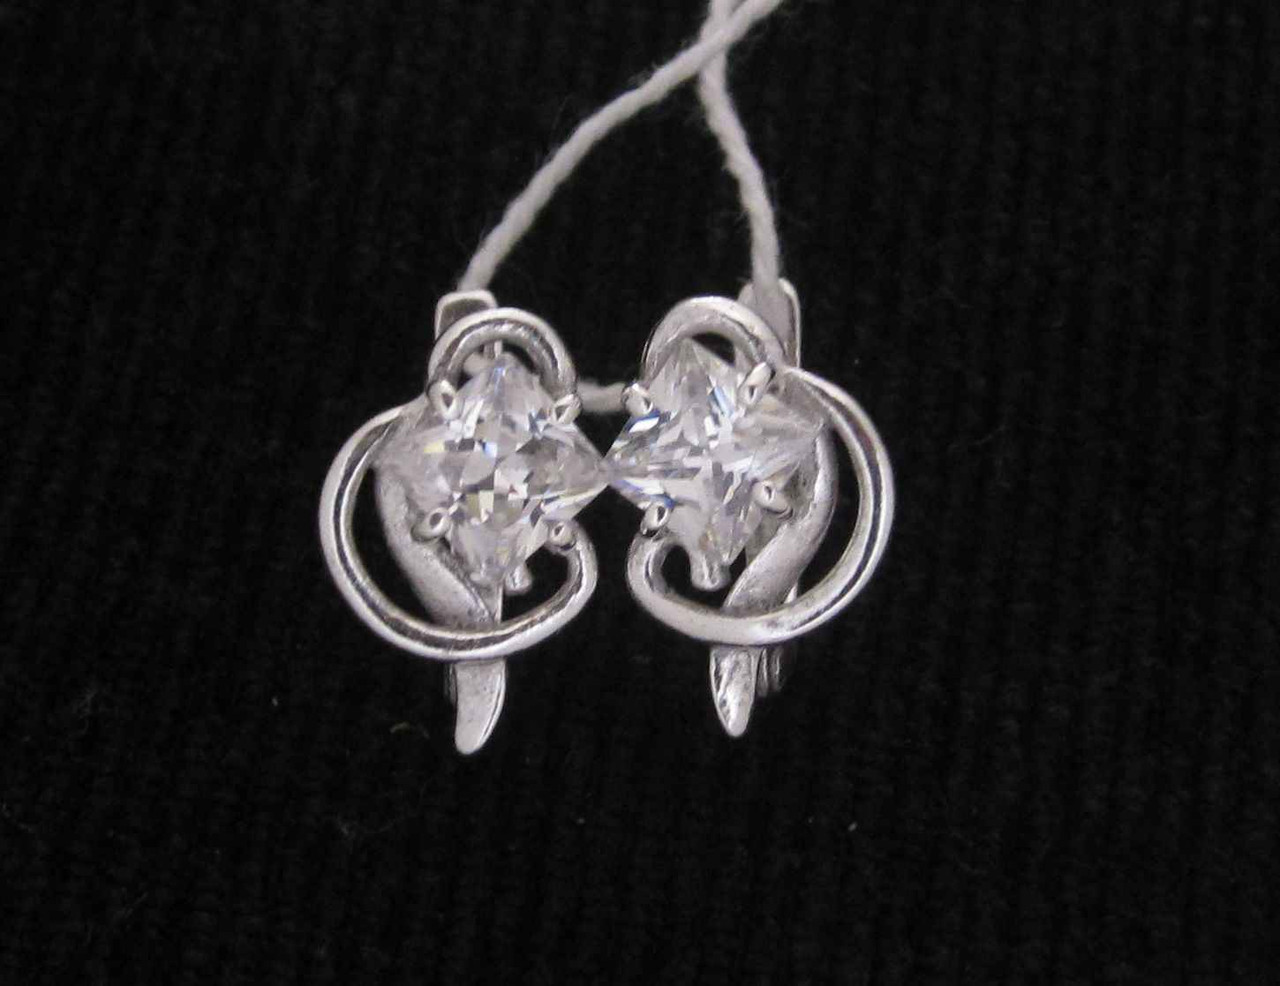 Серьги серебро 925 проба №254